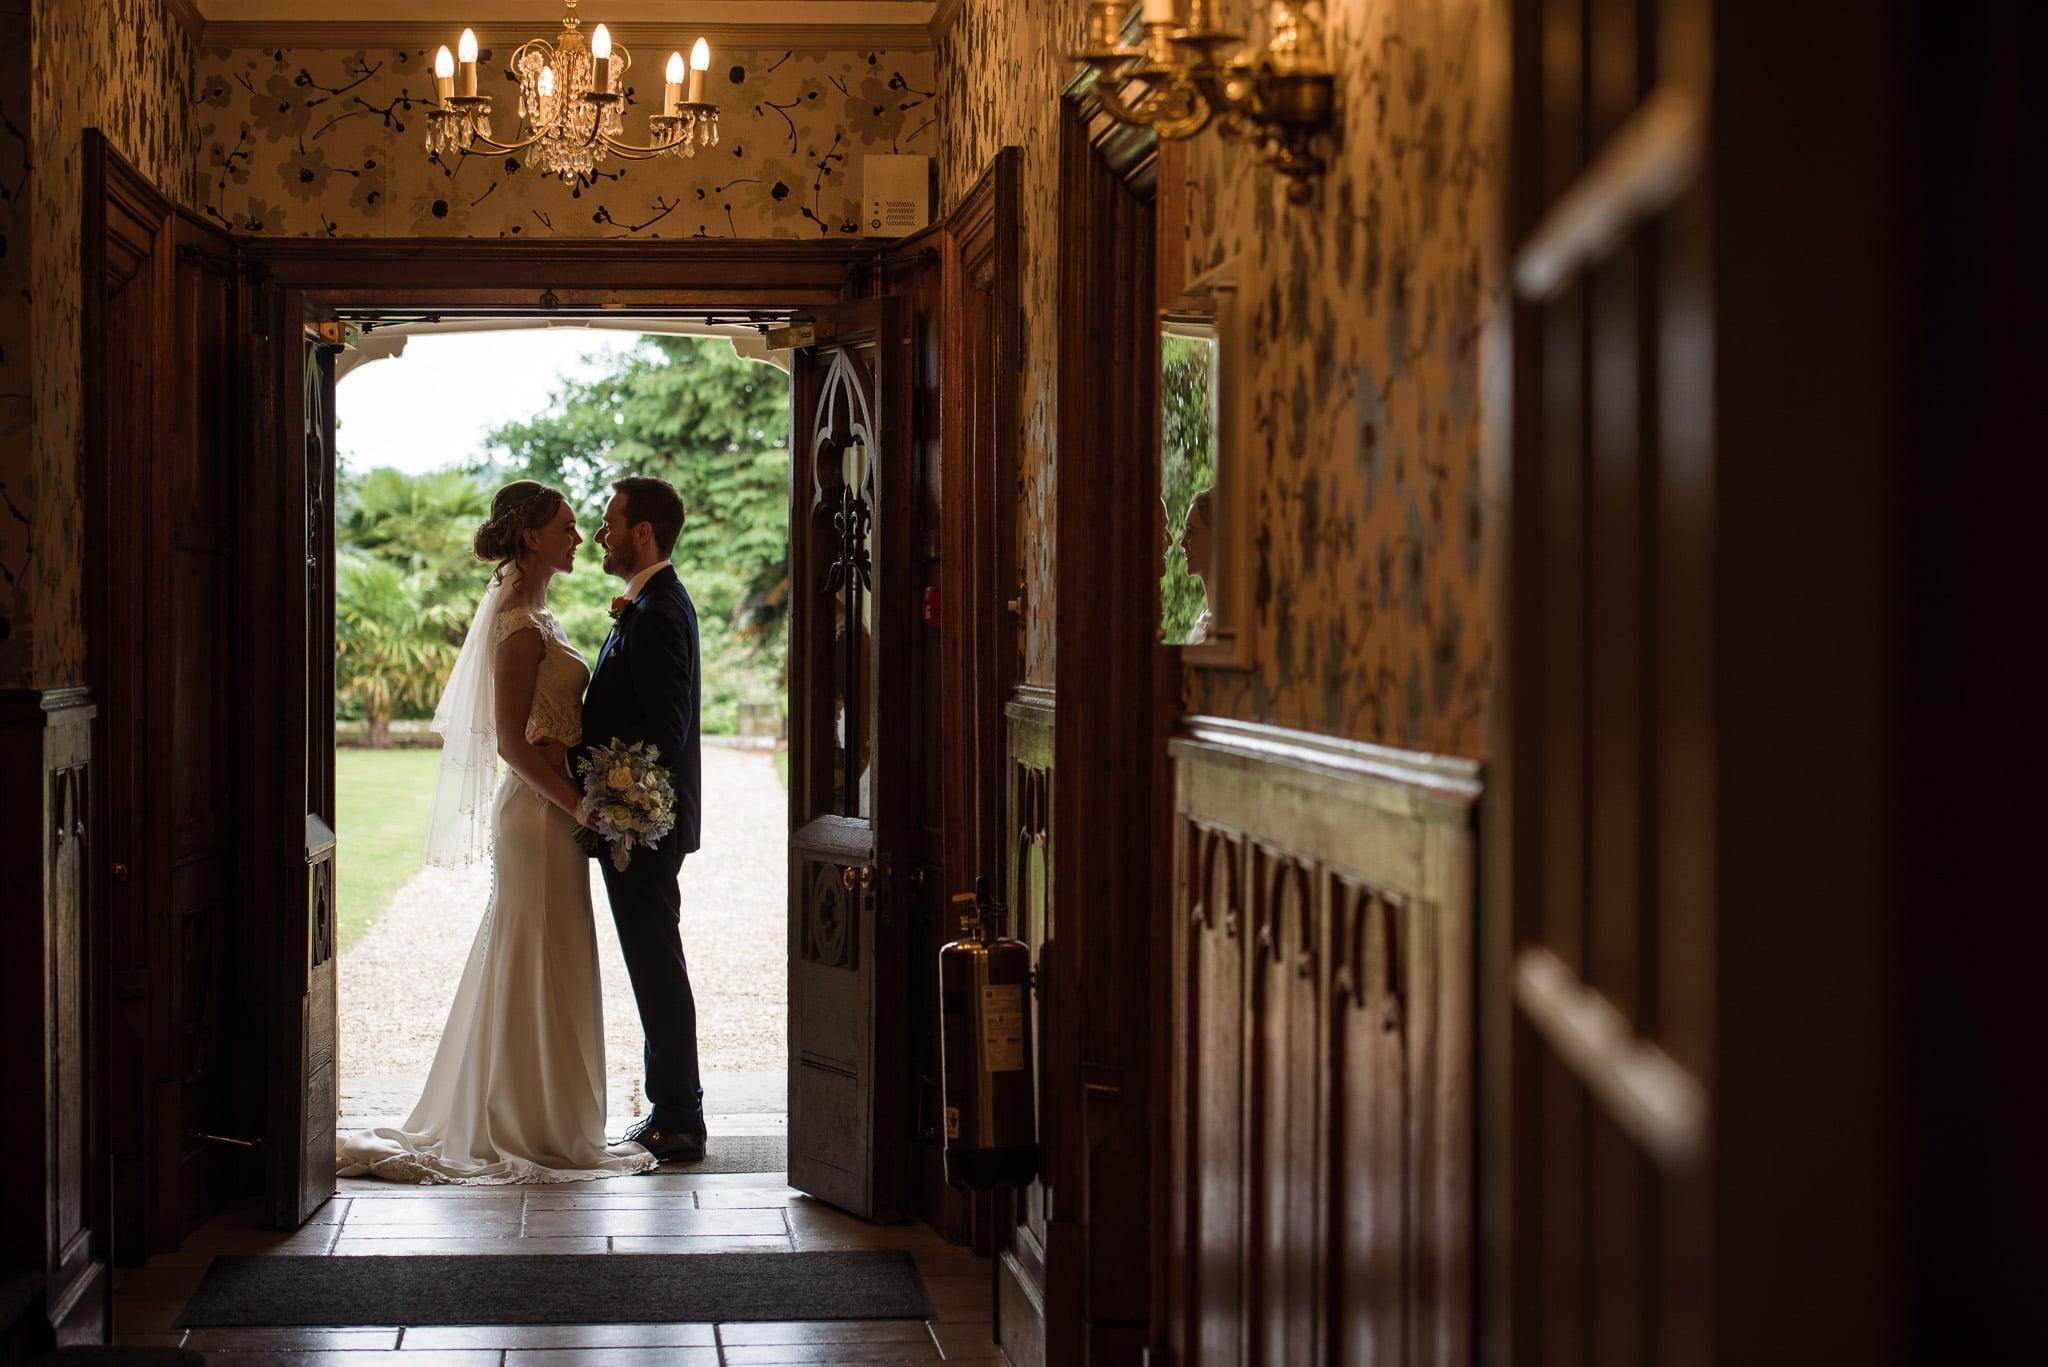 Sumer Wedding at Alexander House Hotel